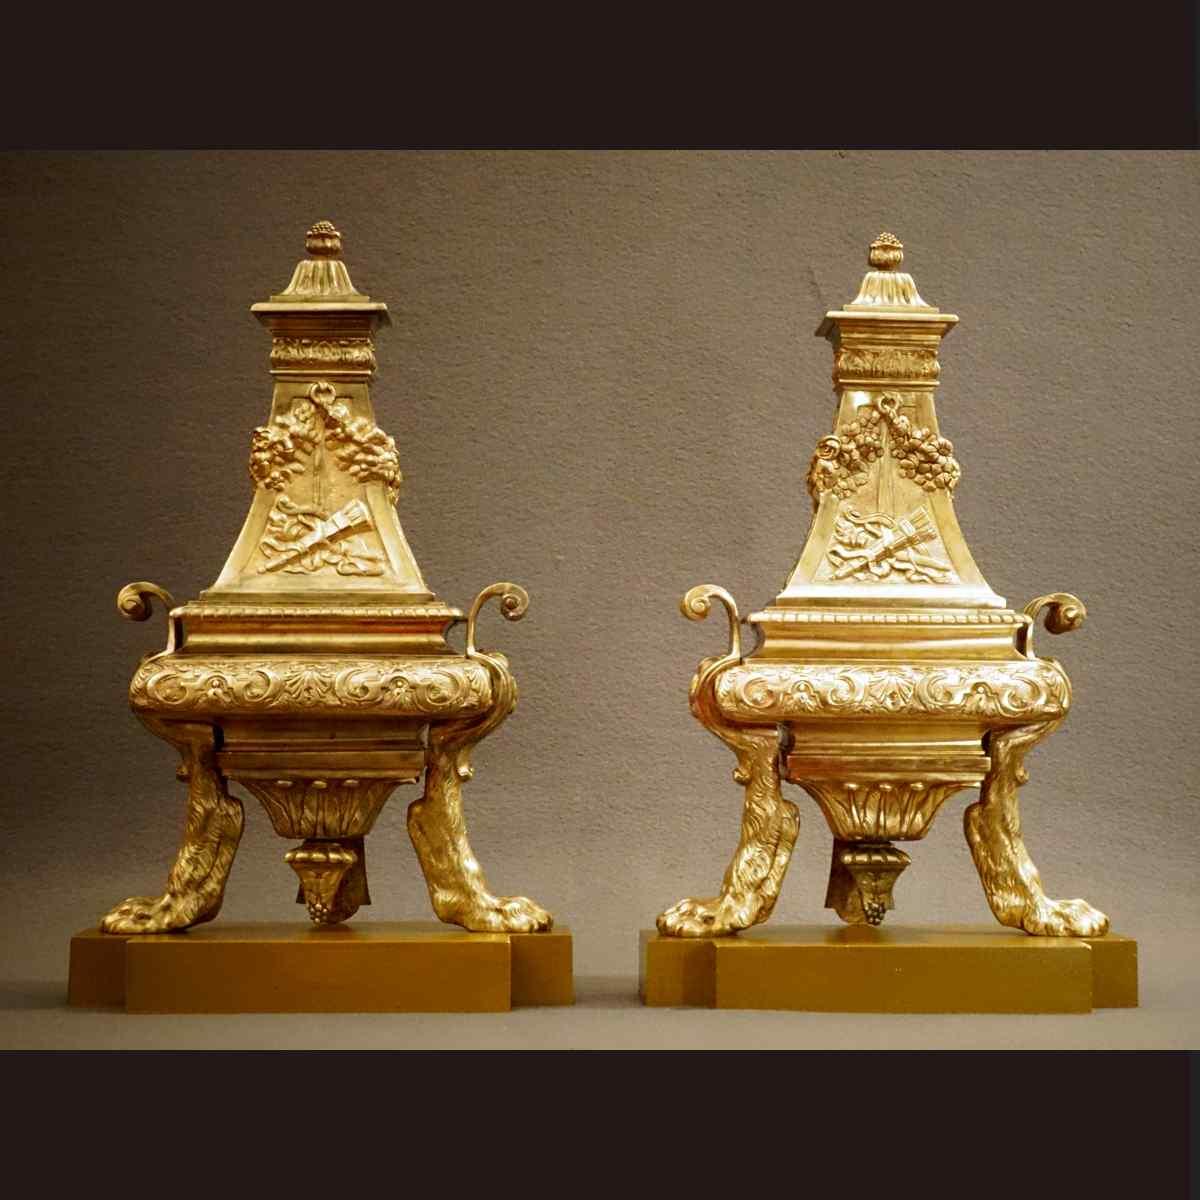 Pair Of Large Regency Style Andirons XIXth